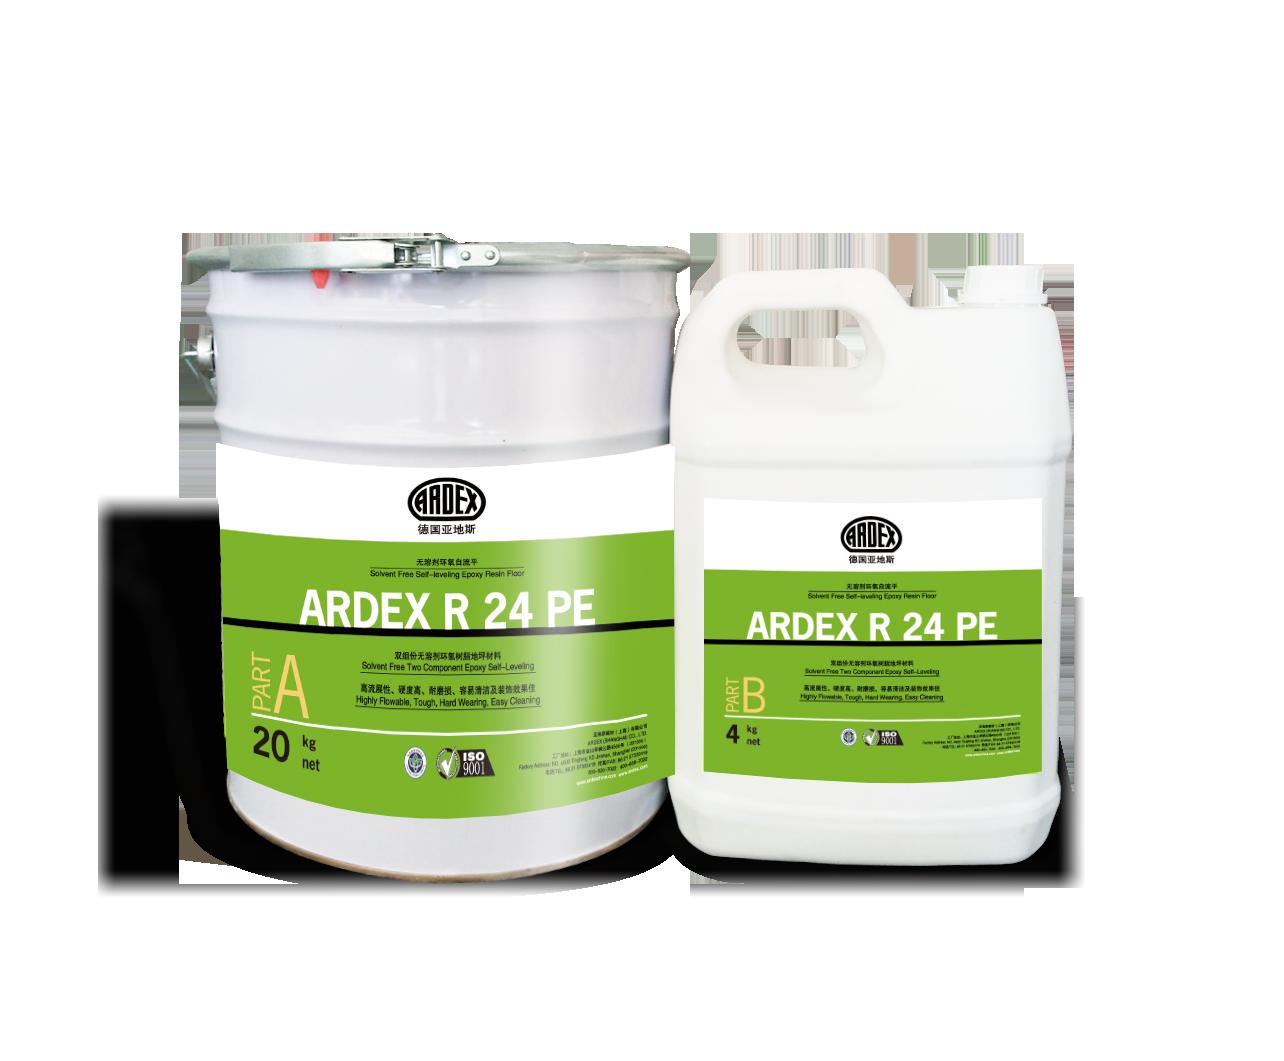 ARDEX R 24 PE